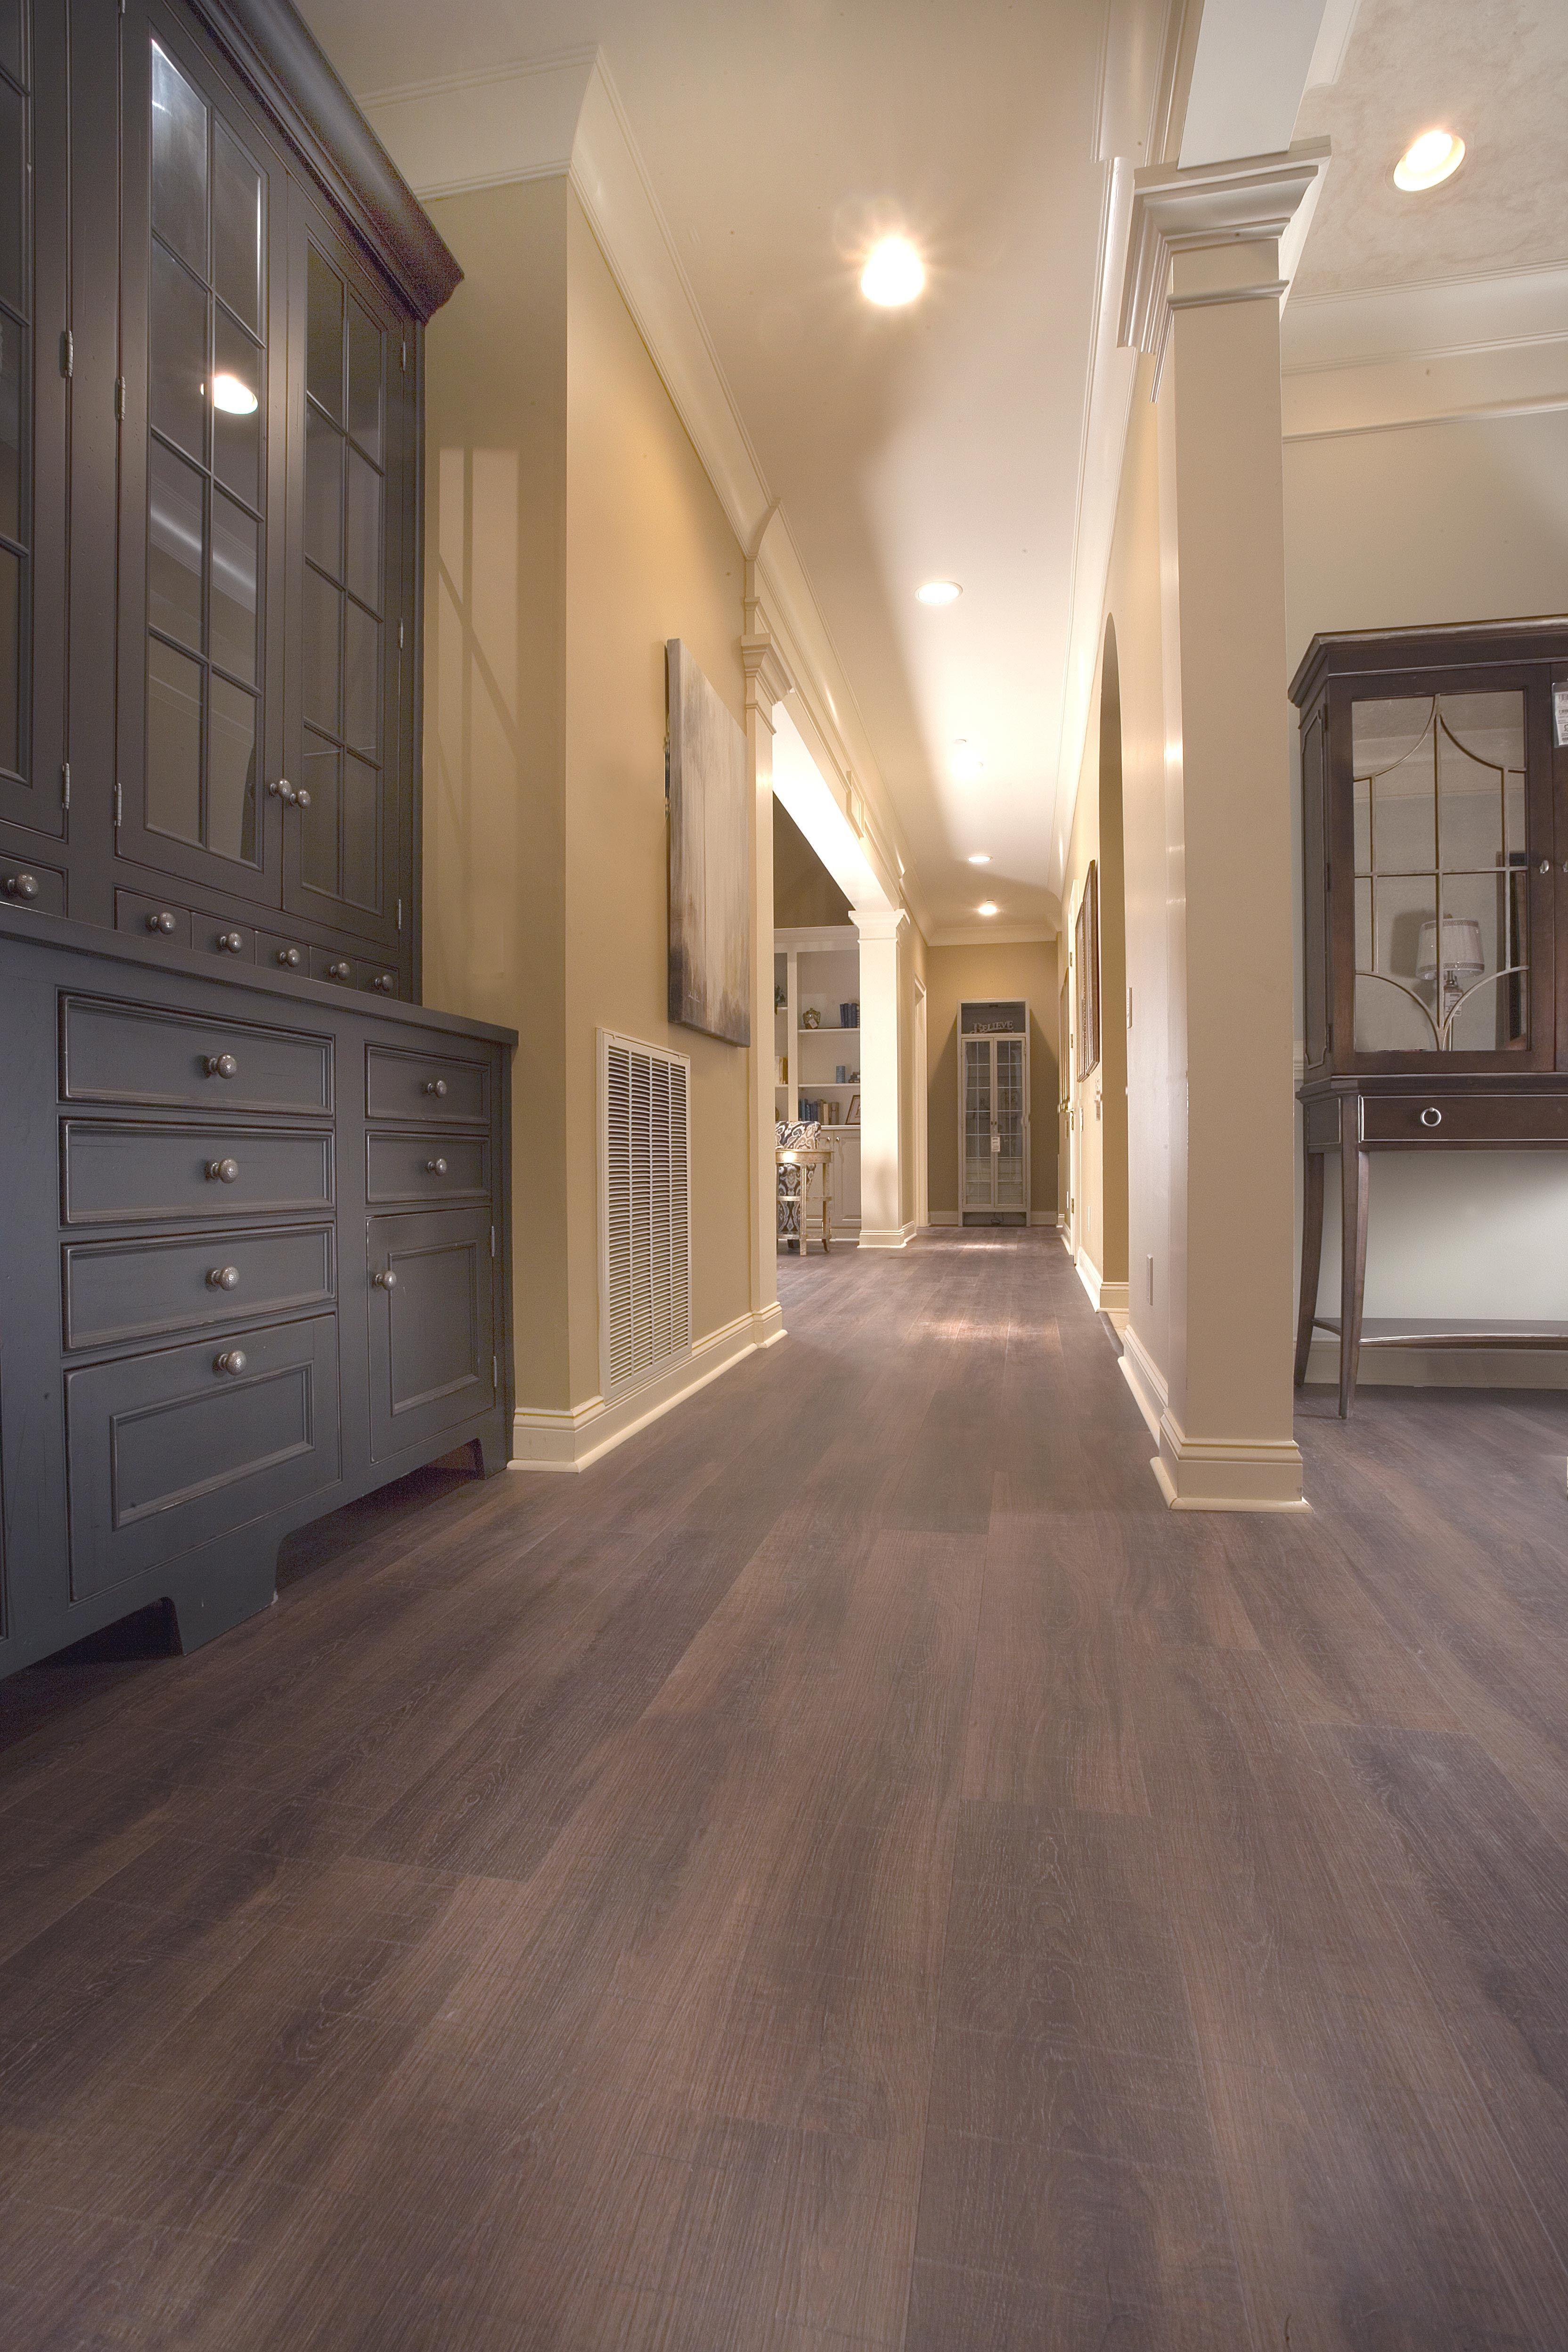 Waterproof Kitchen Flooring Real Life Look Of Hardwood But Its A Luxury Vinyl Plank Floor